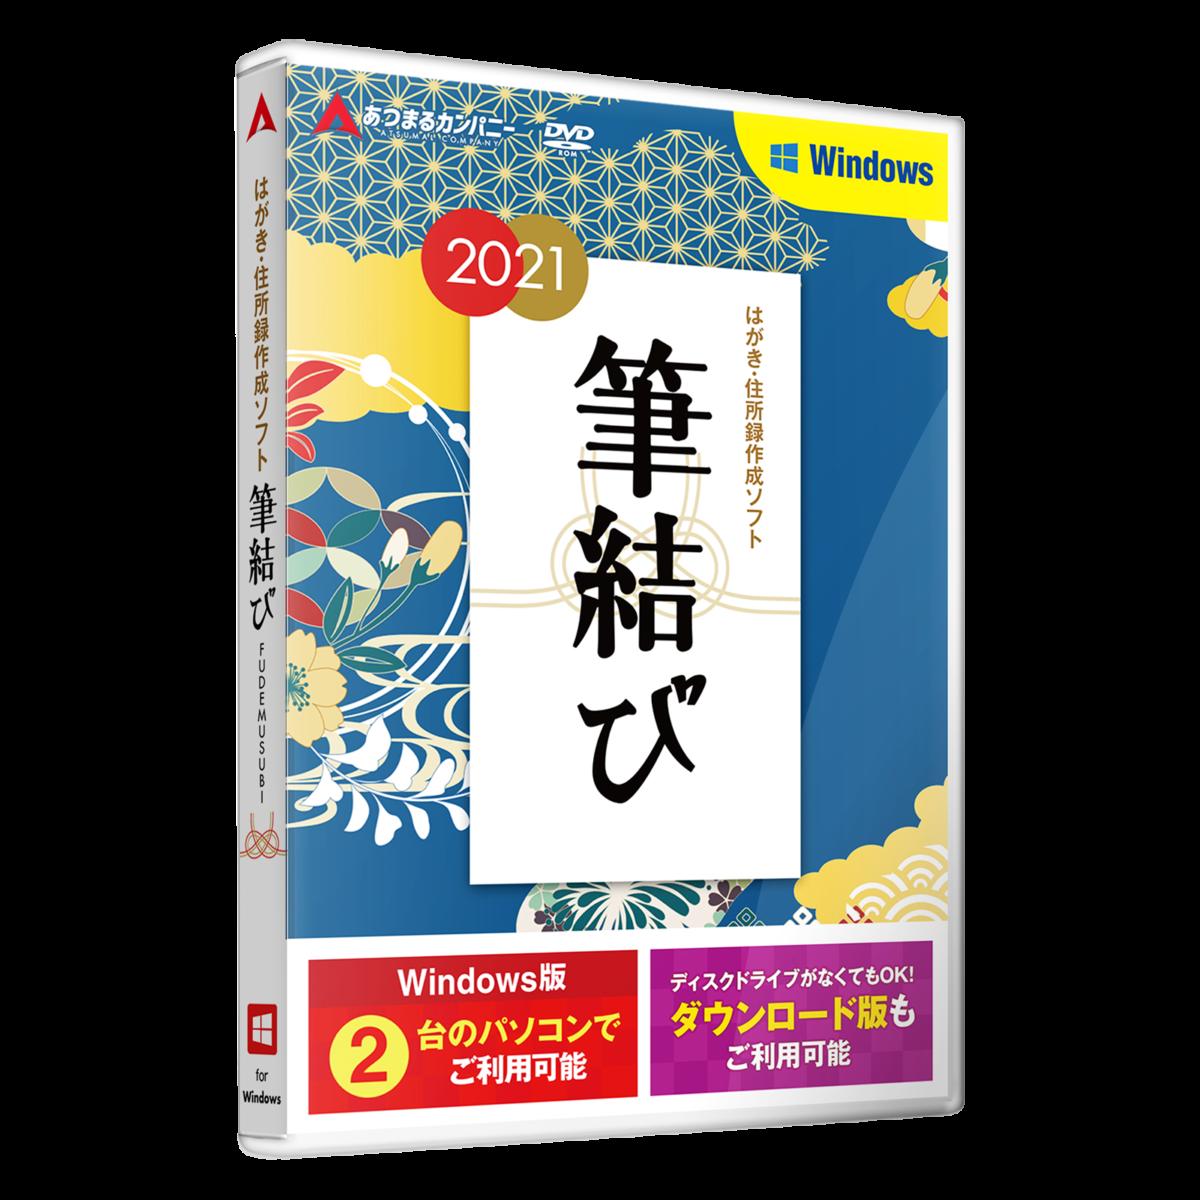 筆結び2021 Windows版